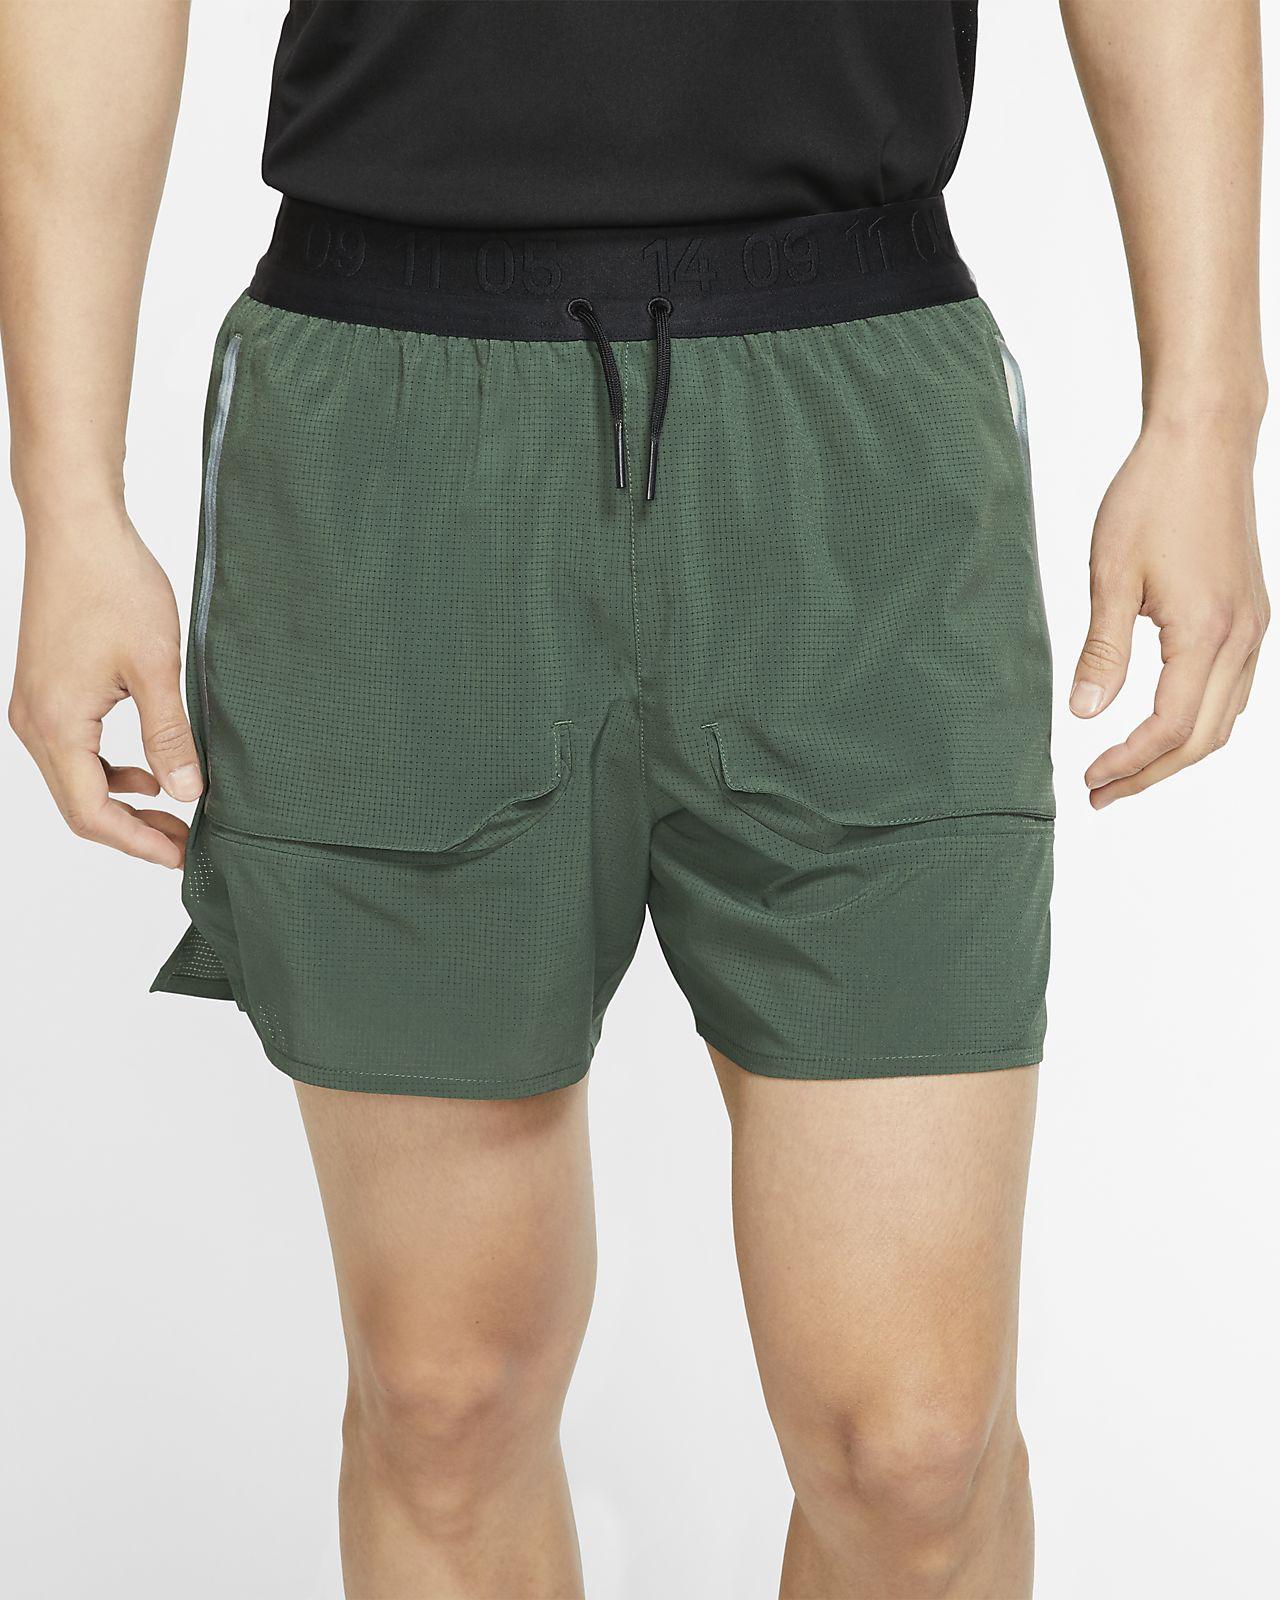 Nike Men's Lined Running Shorts